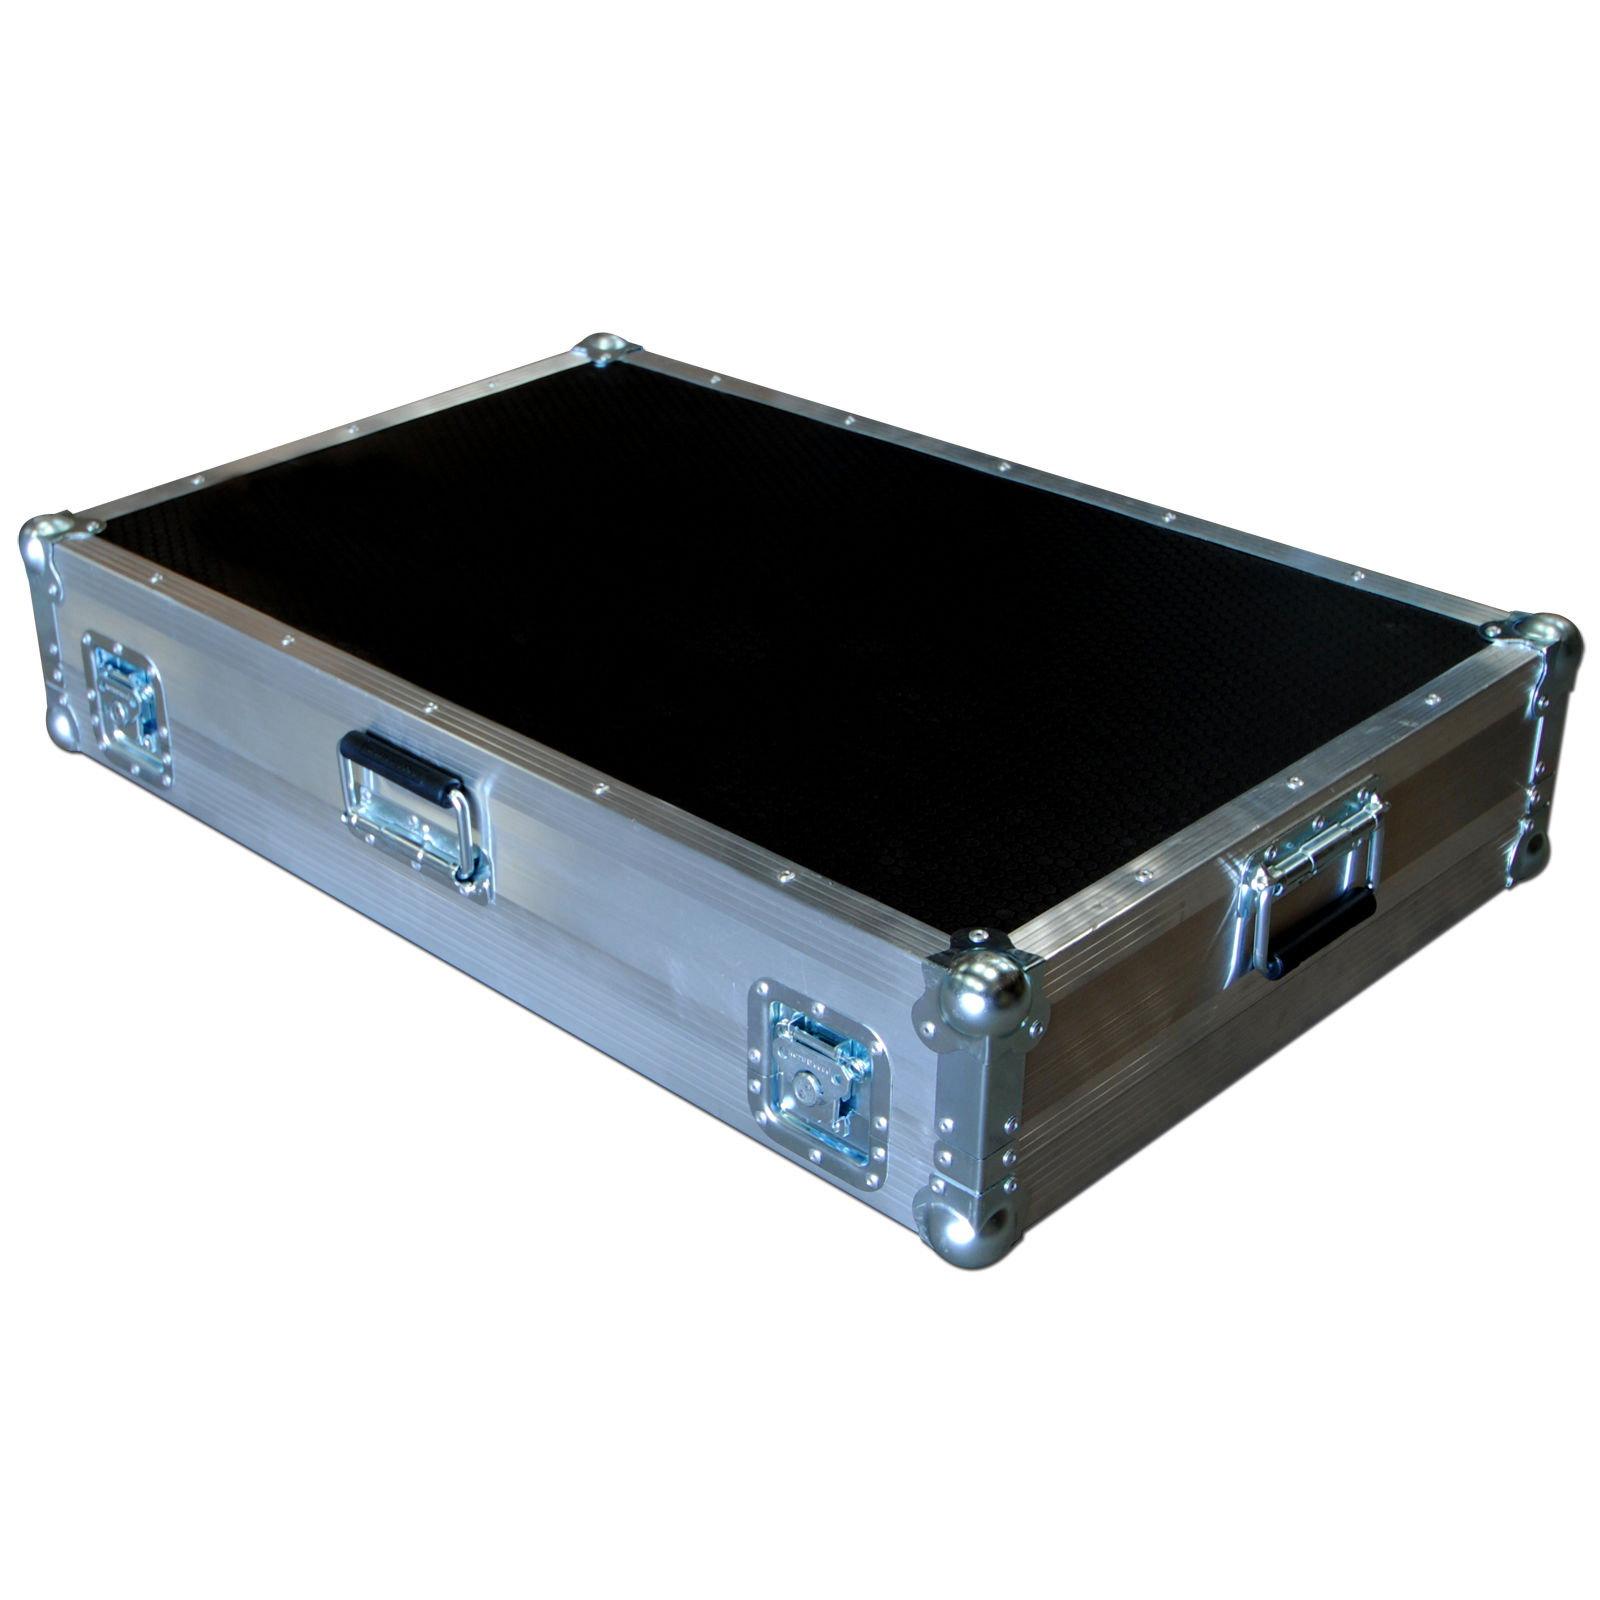 Soundcraft spirit live 4 2 24ch mixer flight case - Fabriquer flight case ...